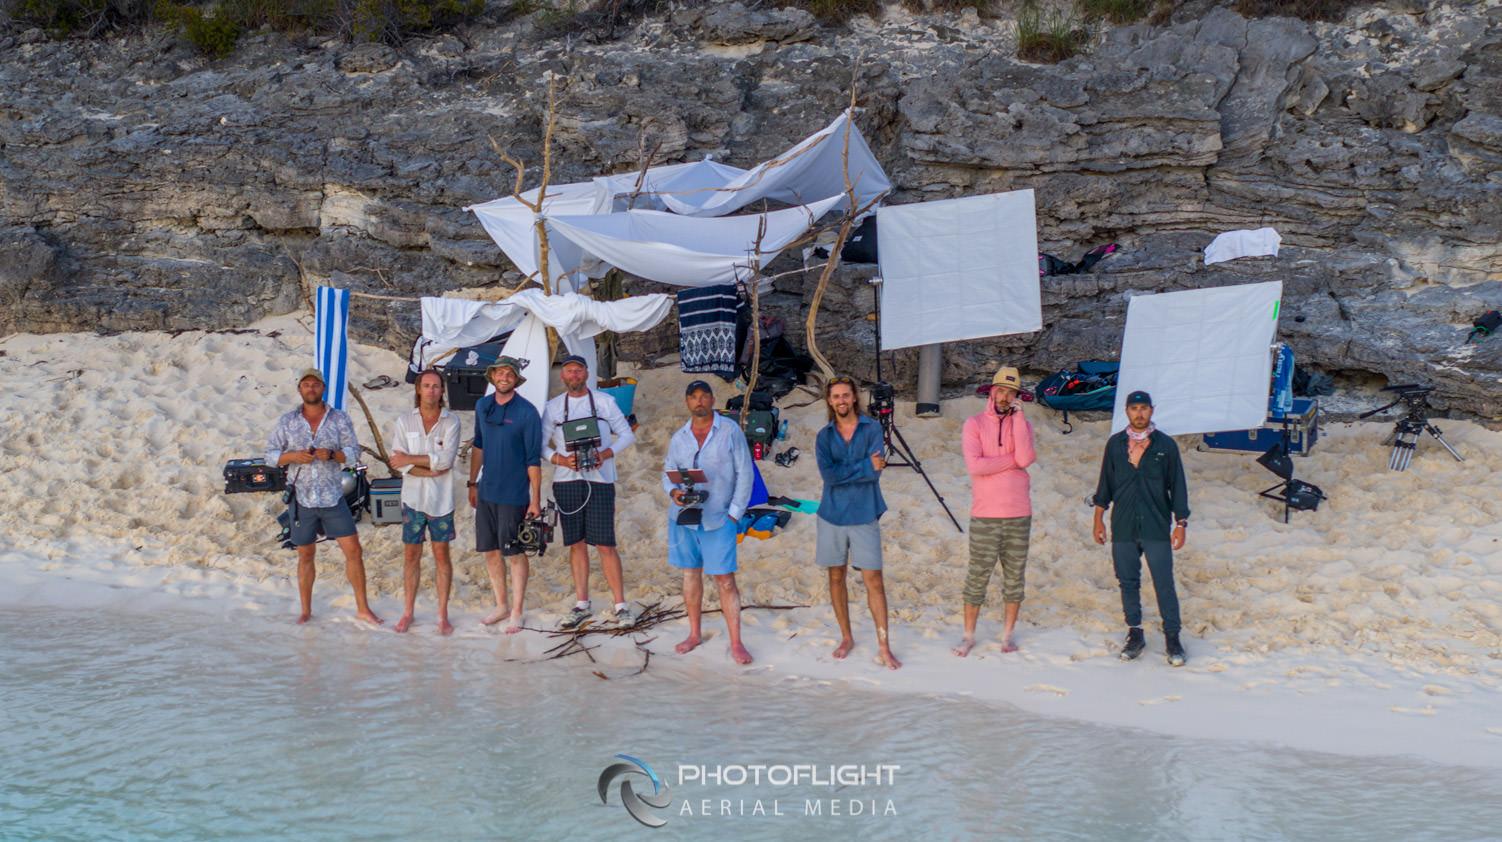 Flying Boat Bahamas Crew, Photoflight Aerial Media, Professional Drone Operator